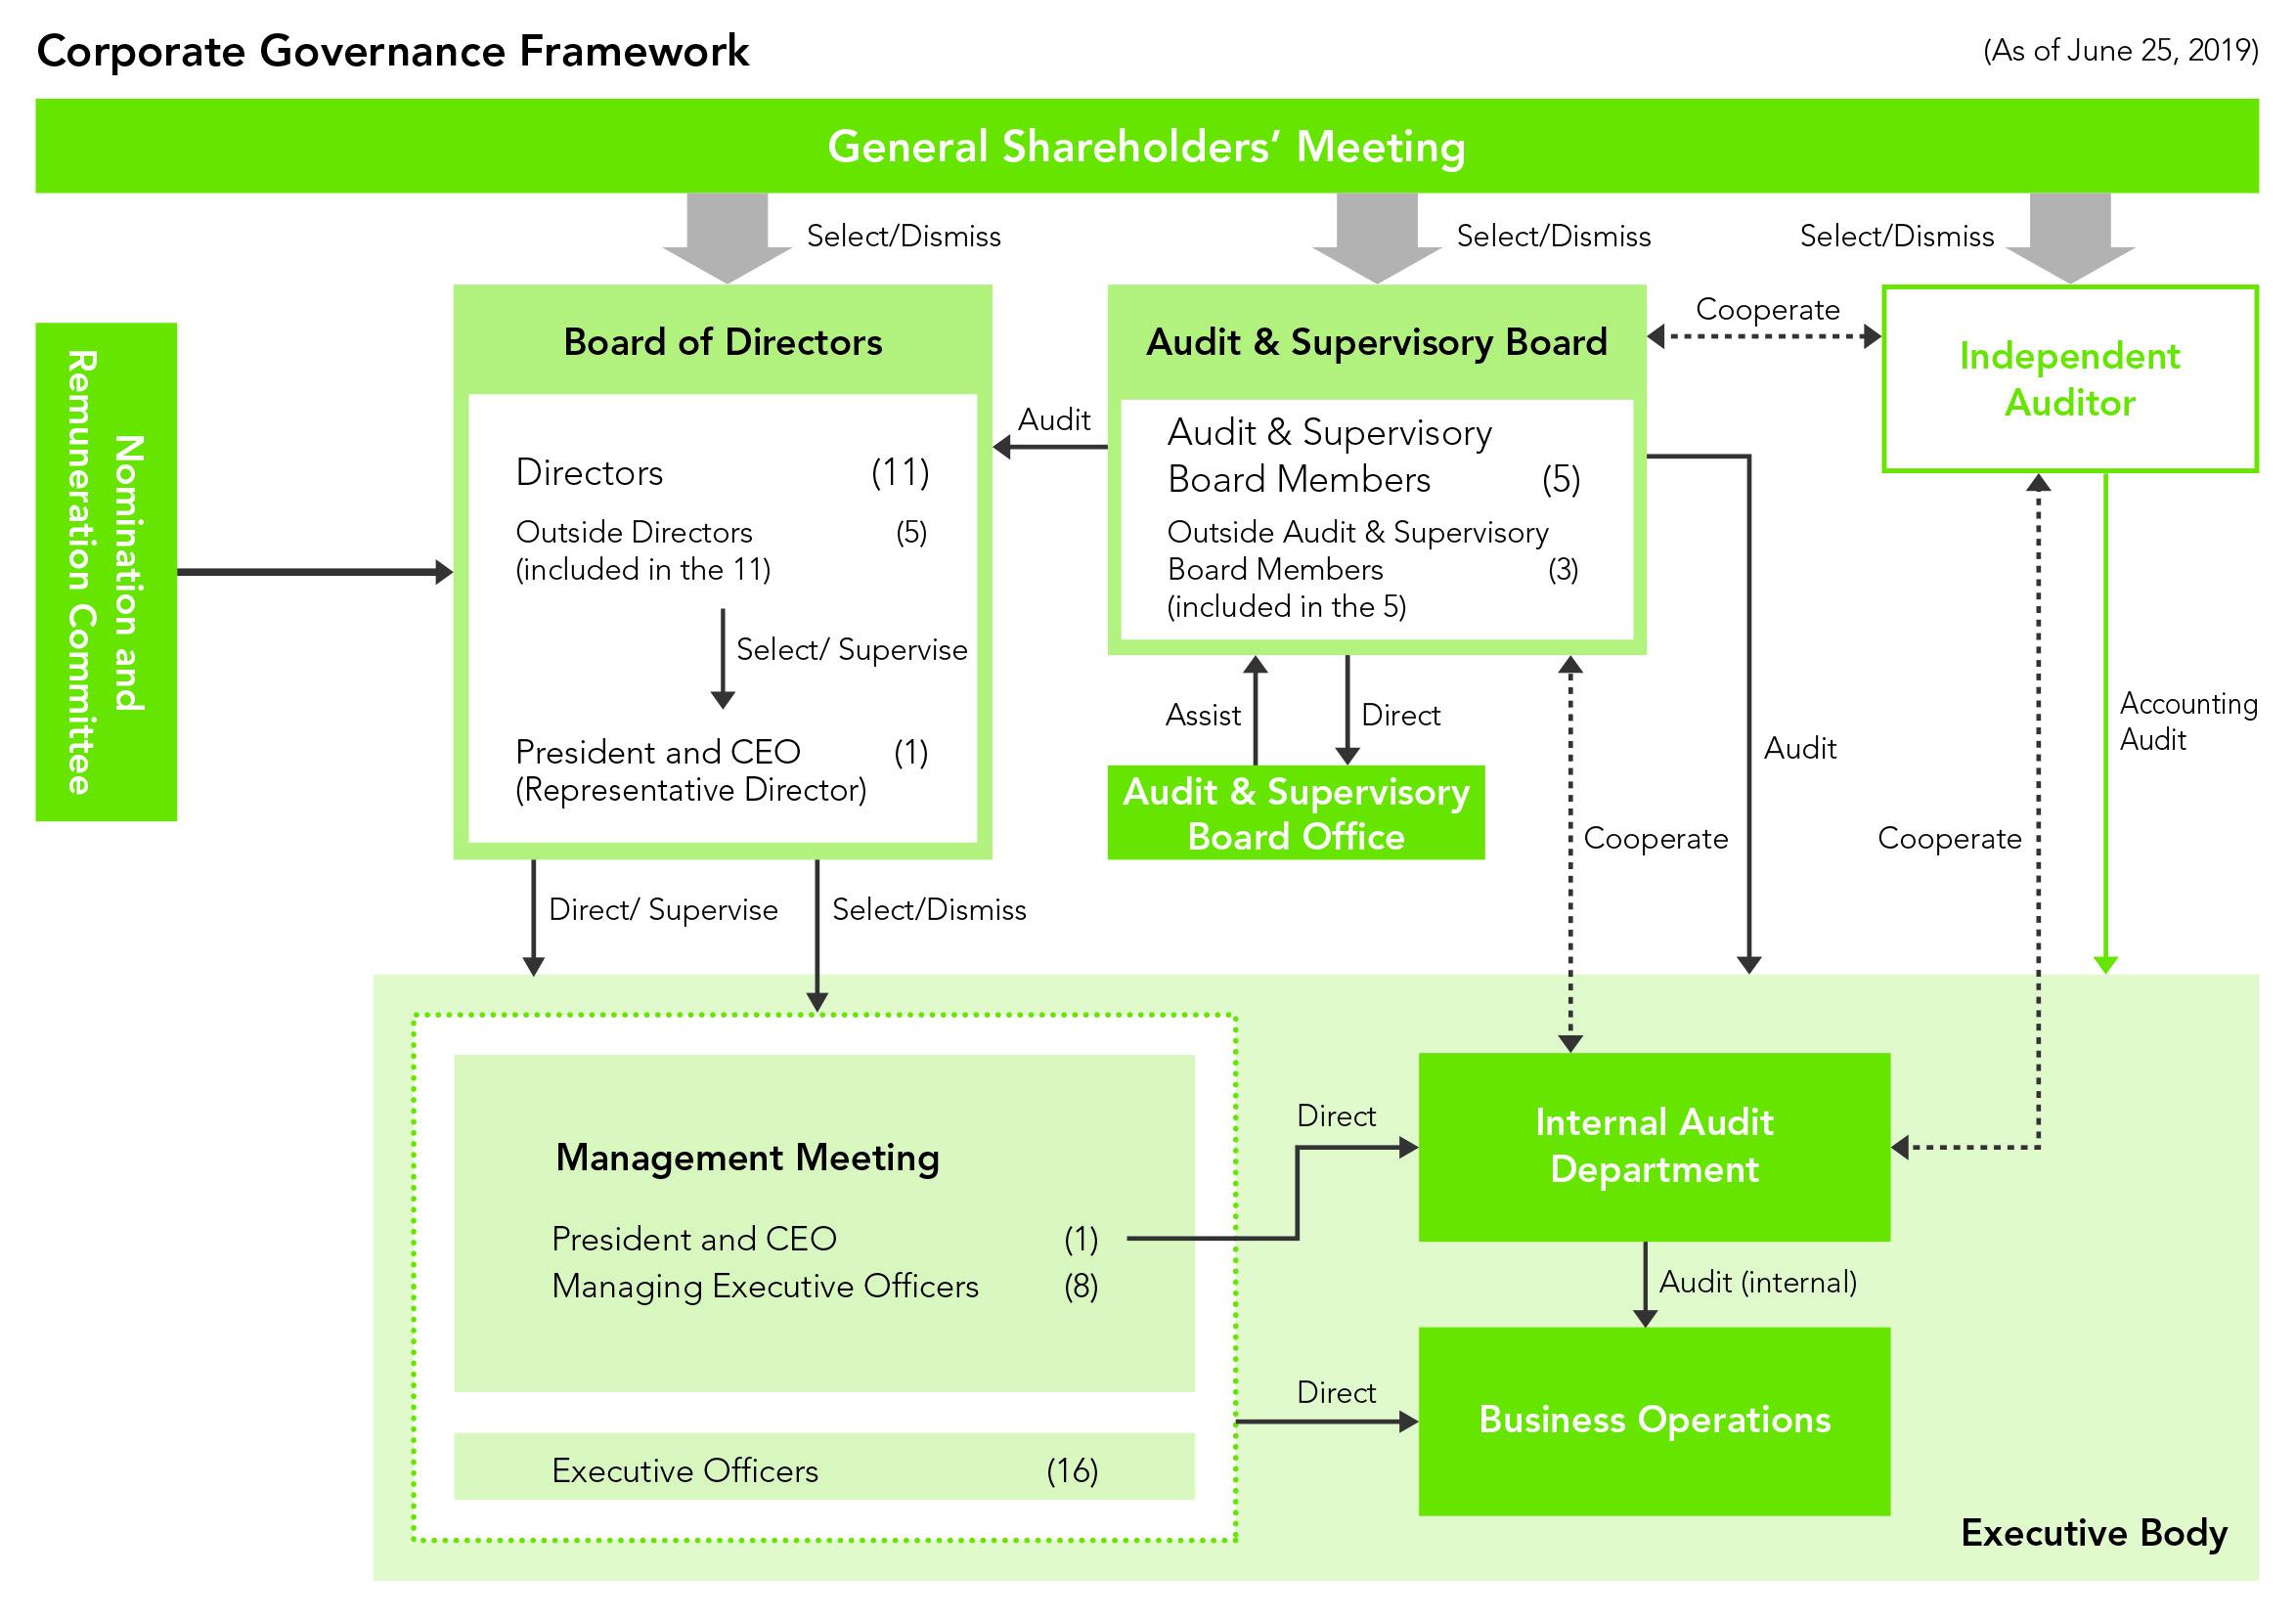 Corporate Governance Framework